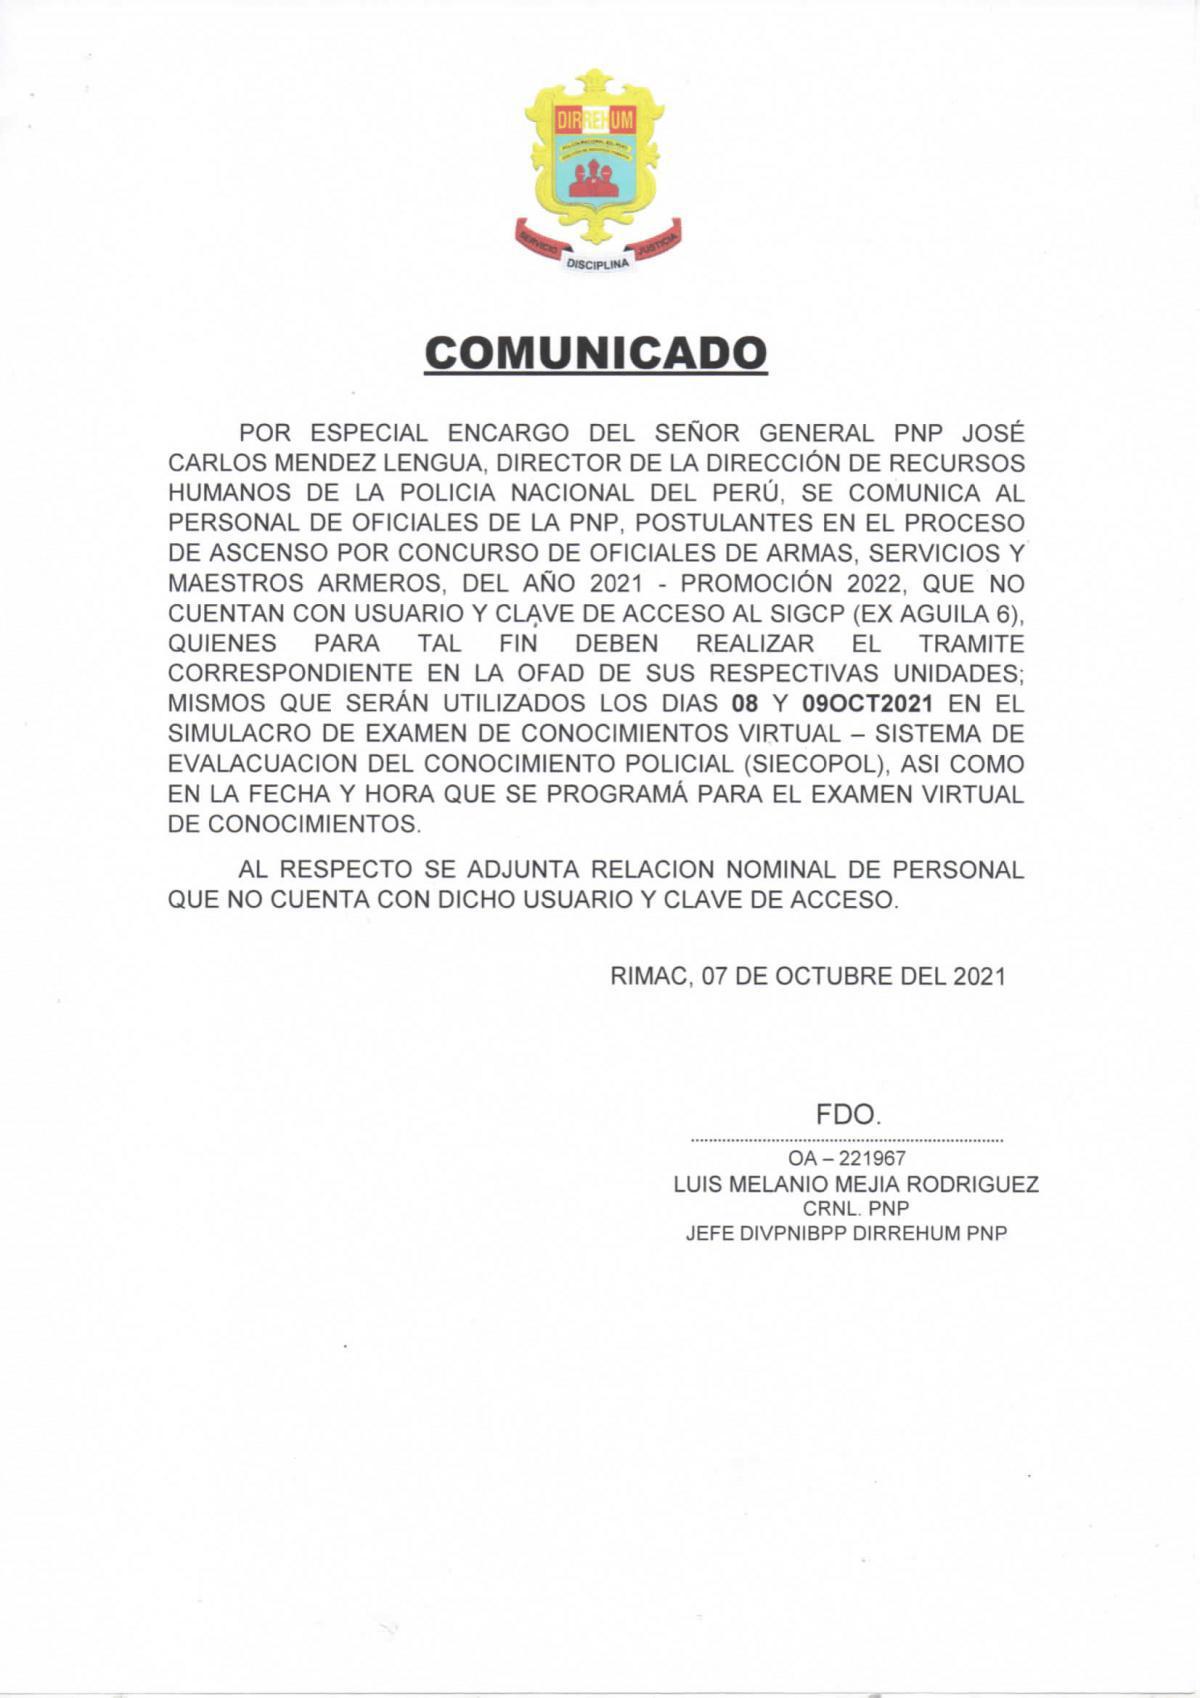 COMUNICADO referente al proceso de ascenso - Oficiales PNP